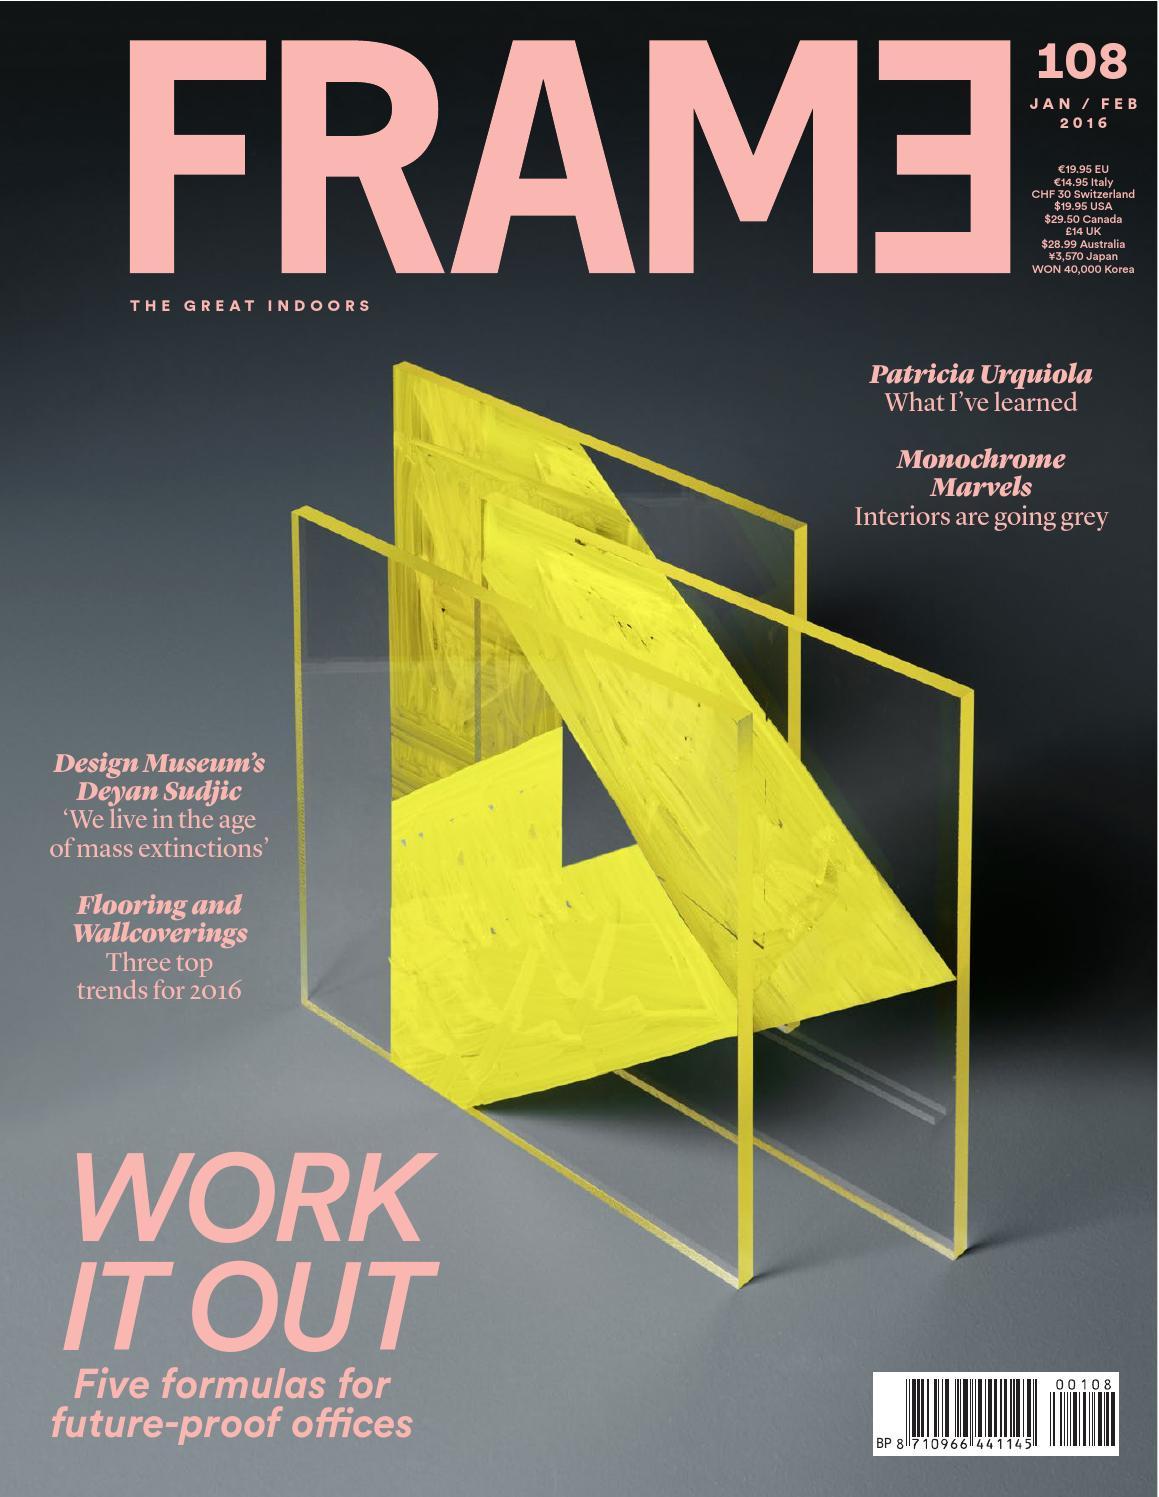 Frame Magazine 108 Jan Feb 2016 By Frame Publishers Issuu